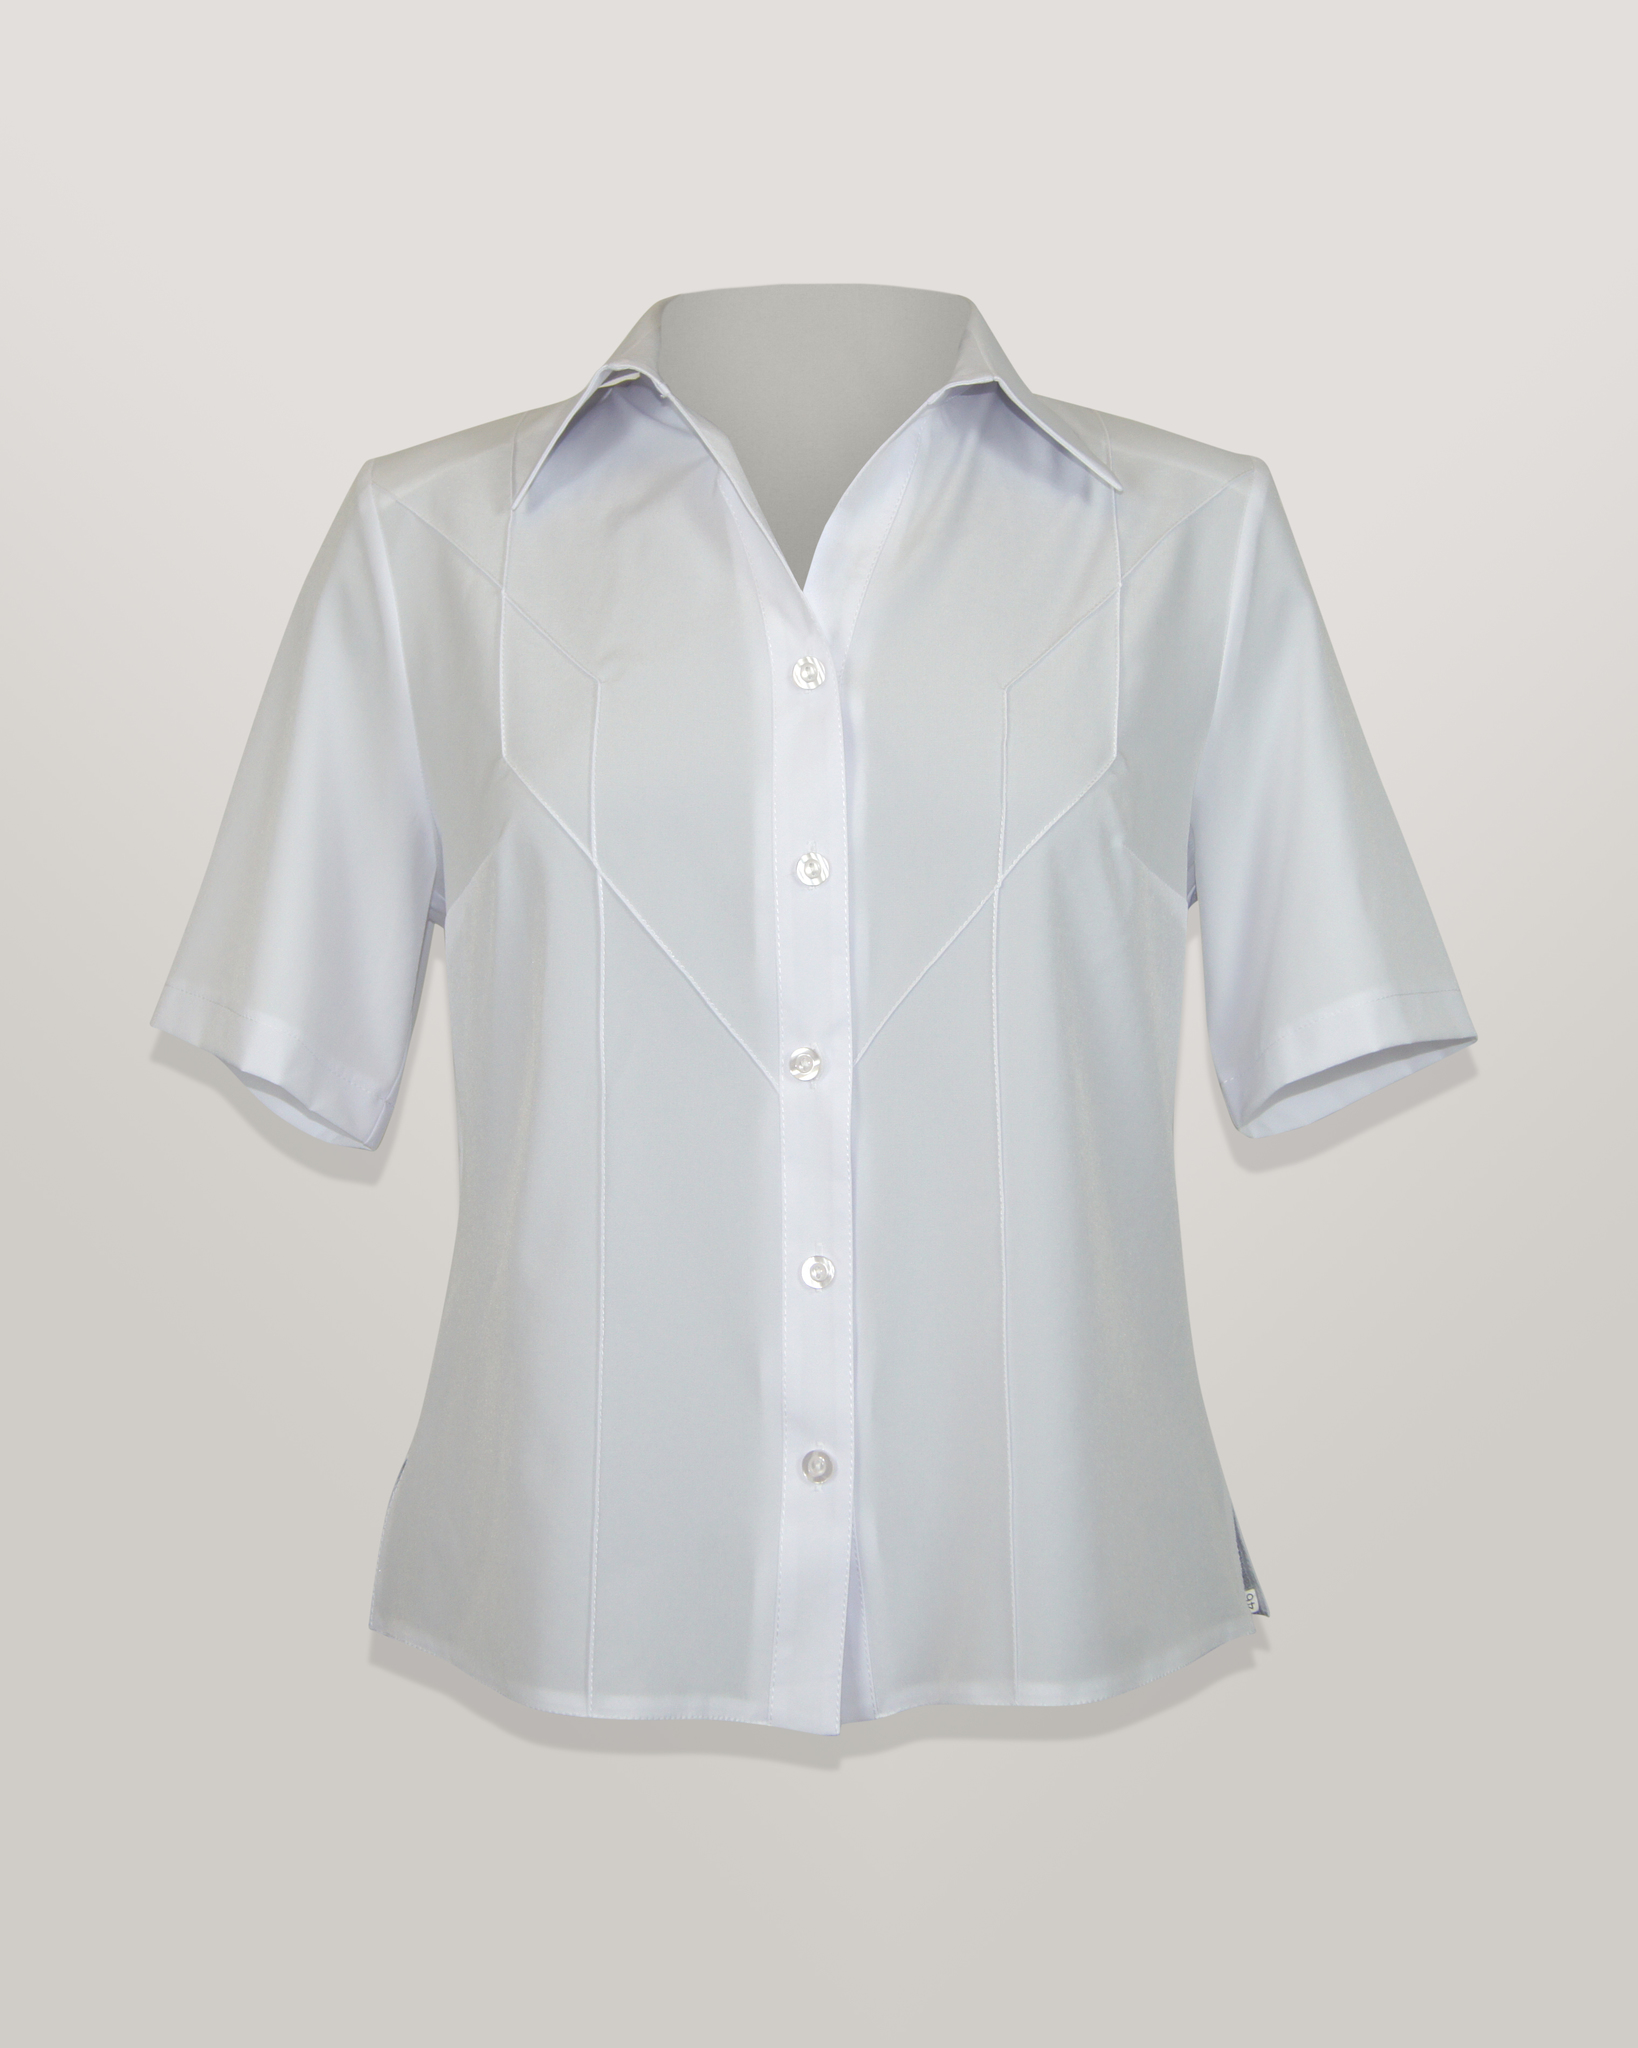 Блузка Jotex рубашка рельеф однотон.